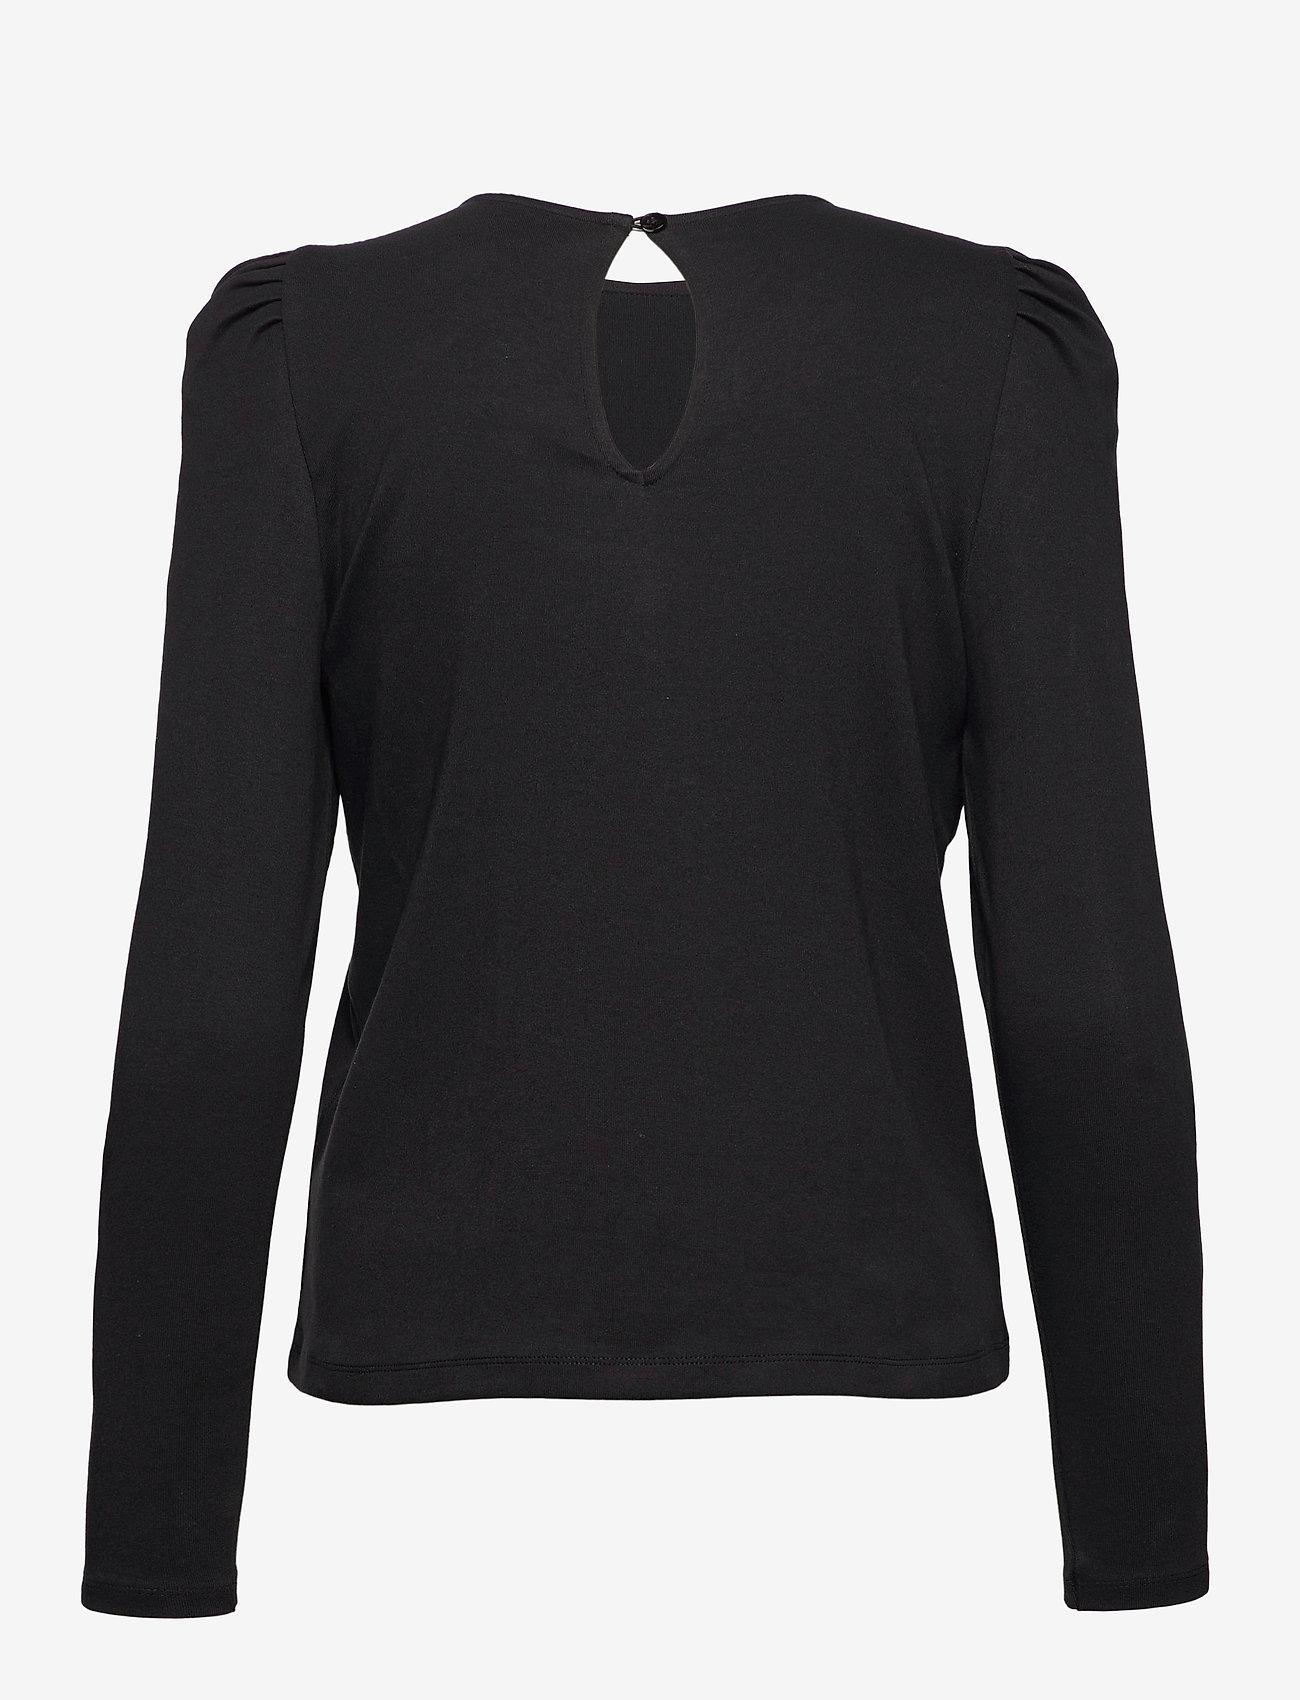 Vero Moda - VMNOREEN LS O-NECK BLOUSE VMA - långärmade blusar - black - 1